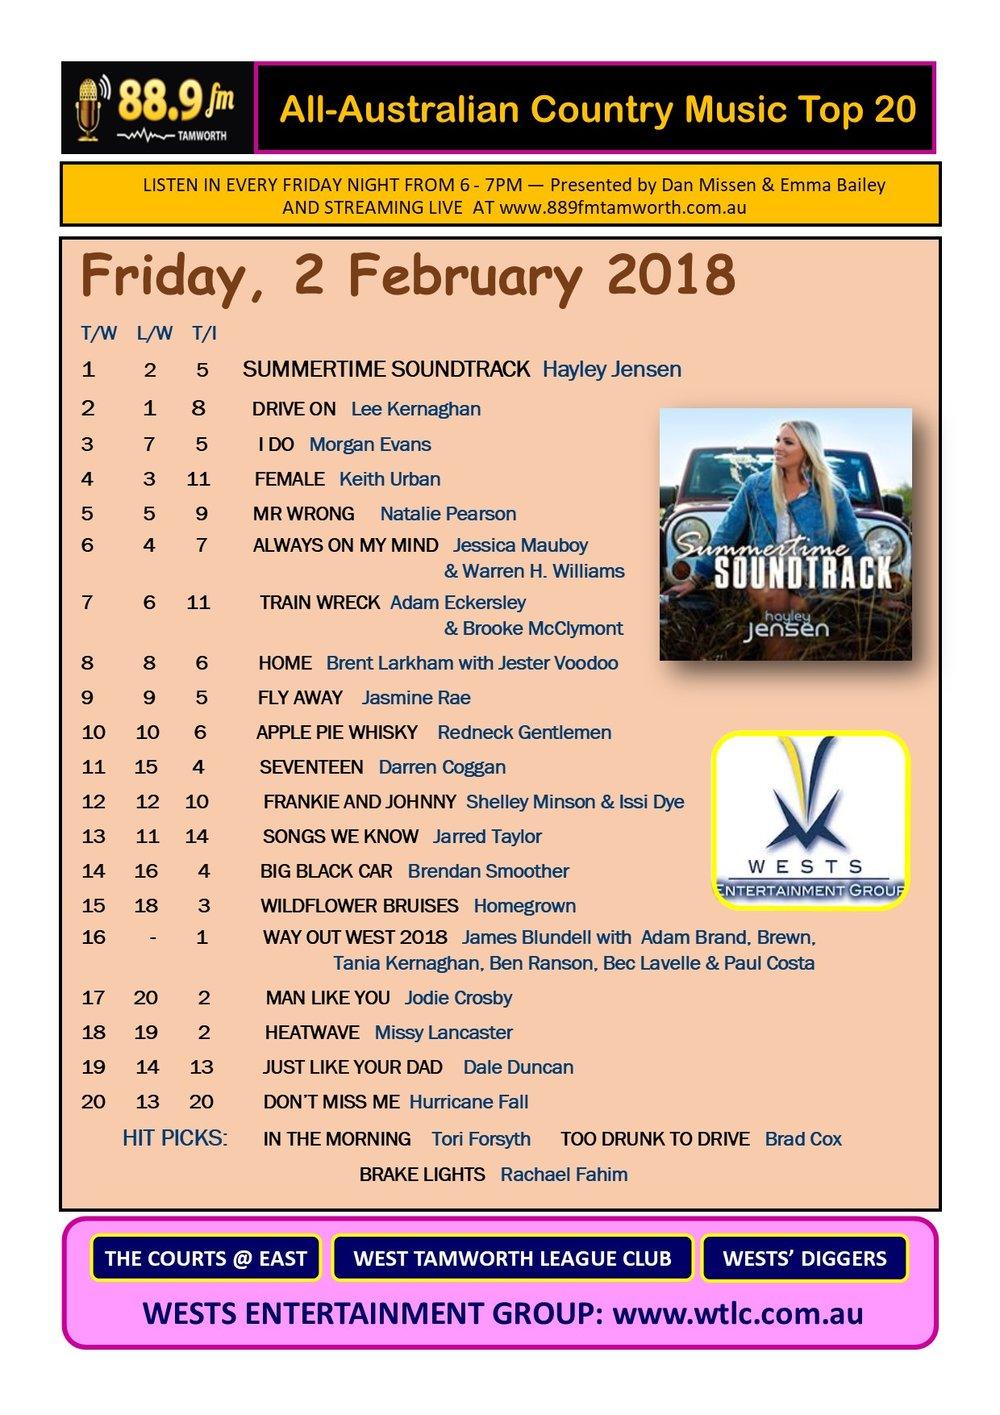 889FM CHART 2 Feb.jpg